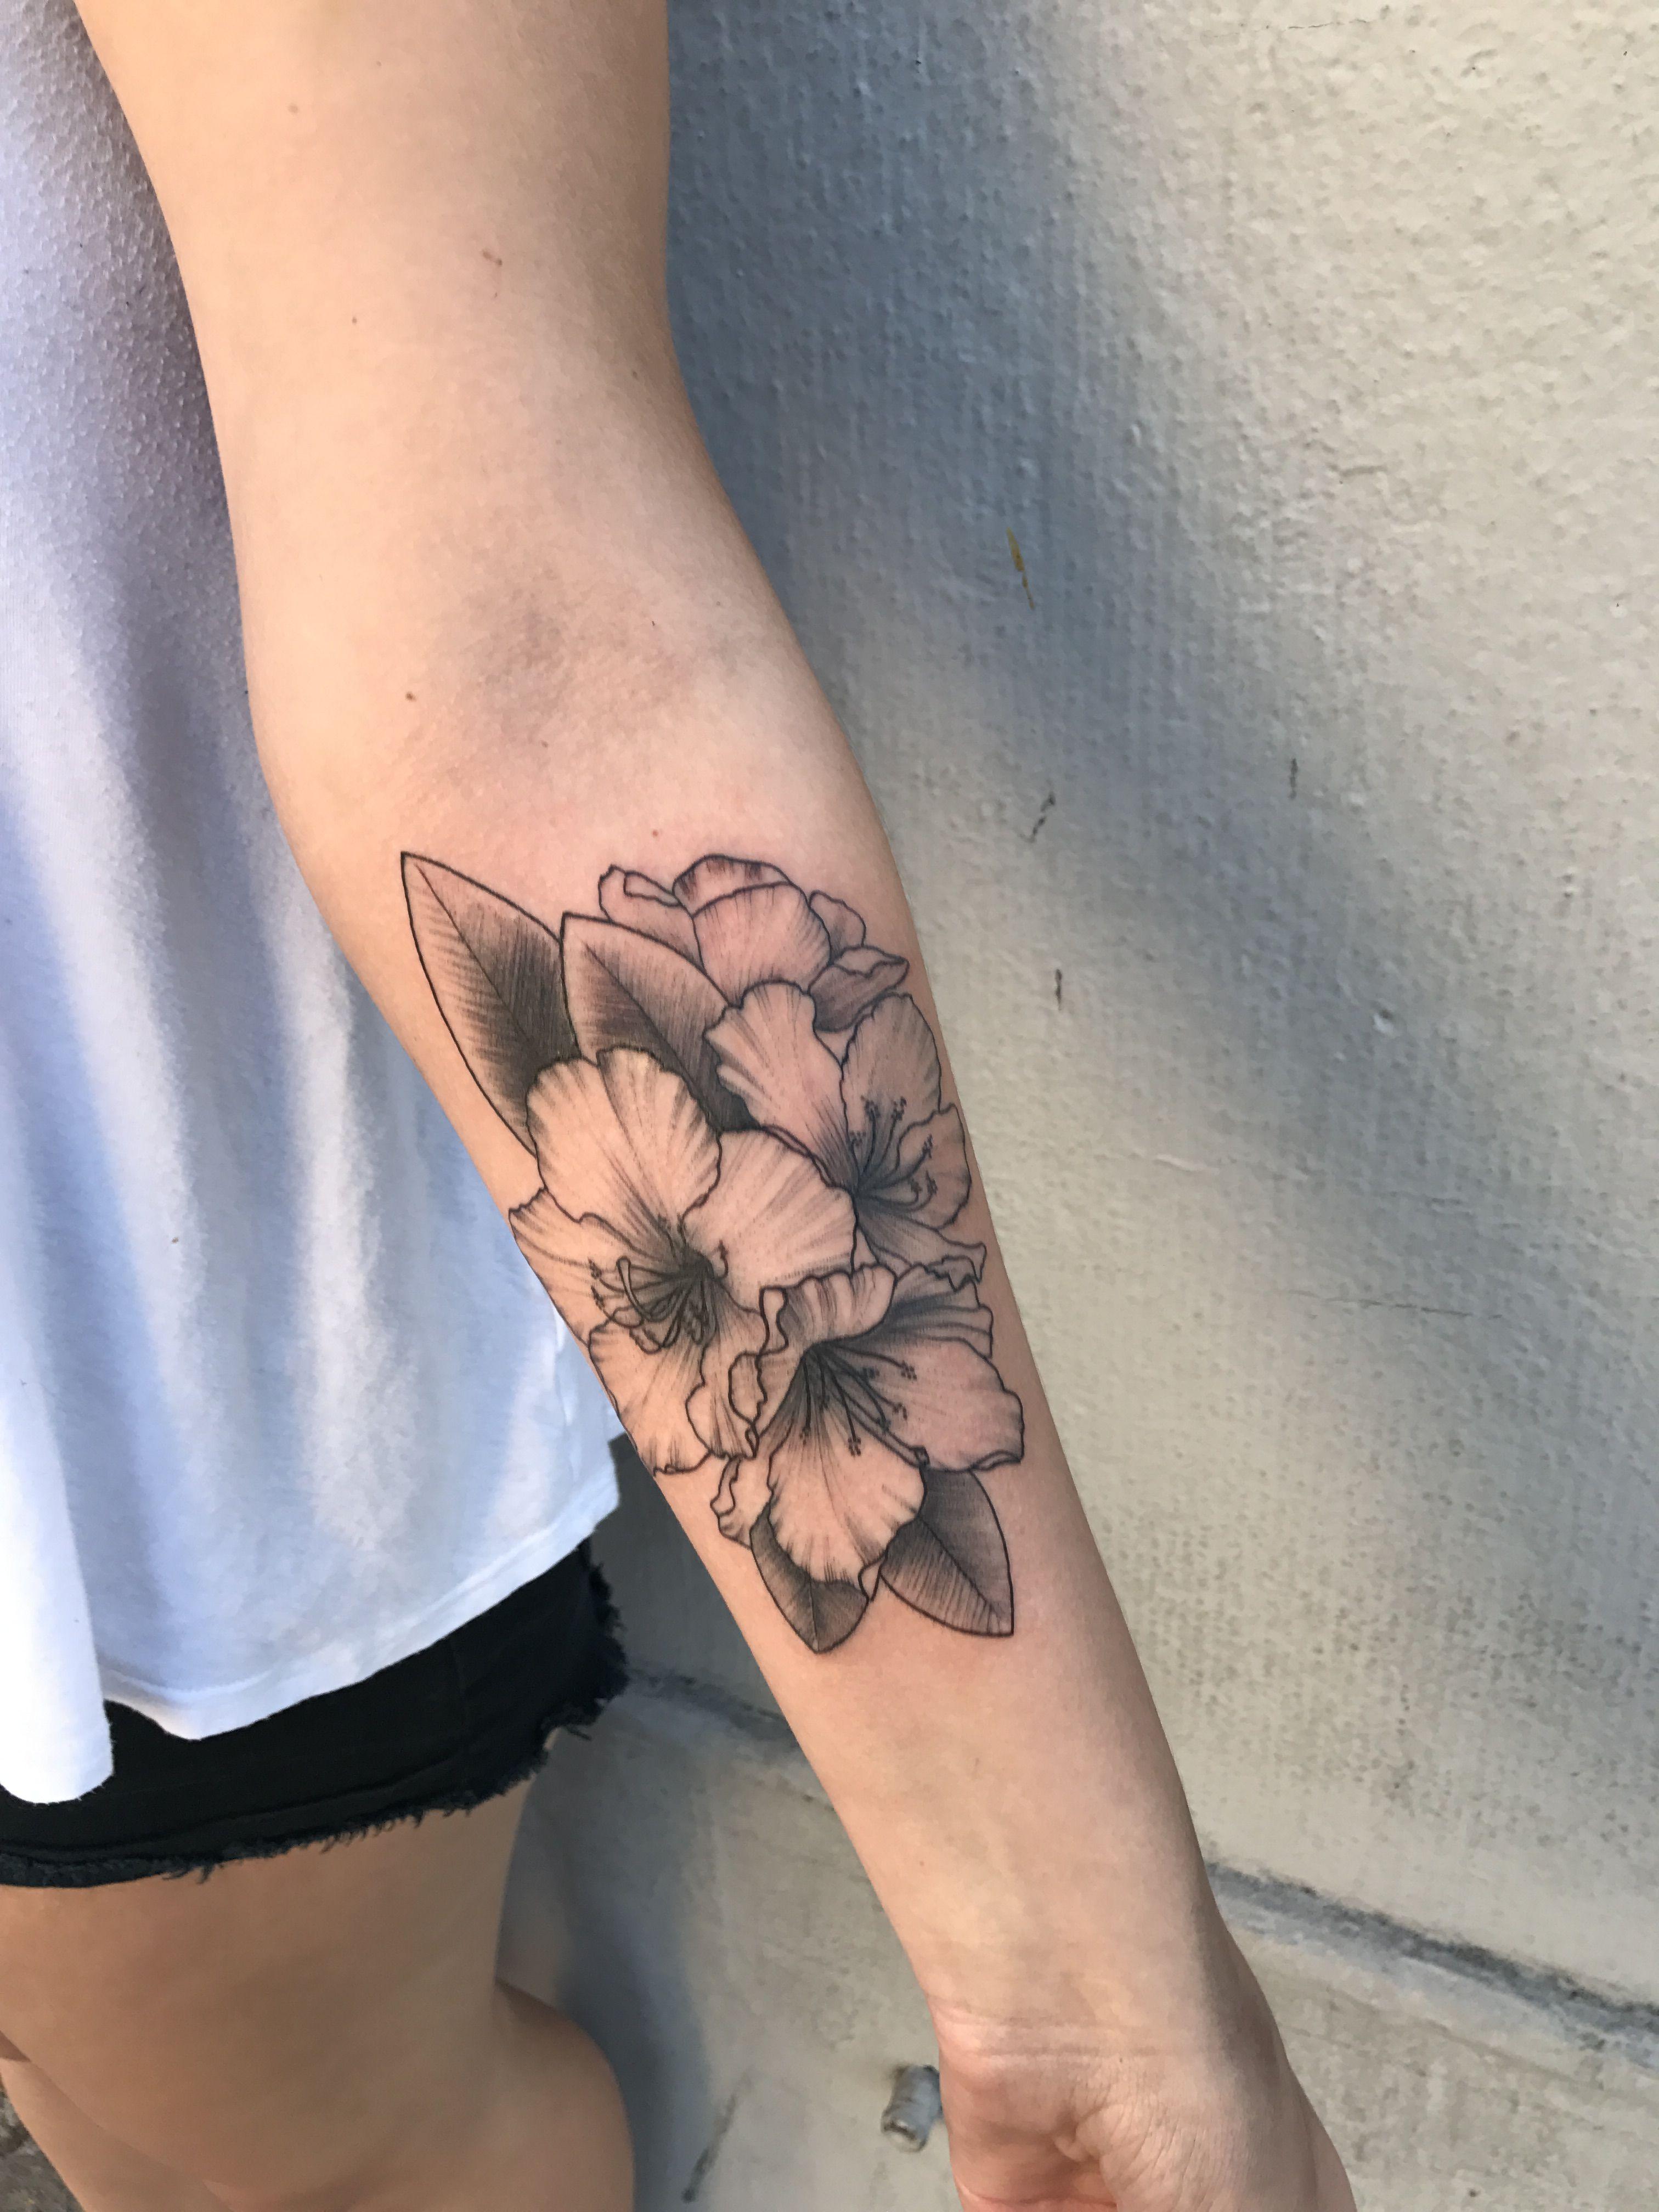 Rhododendron arm tattoo Arm tattoo, Tattoos, Flower sleeve